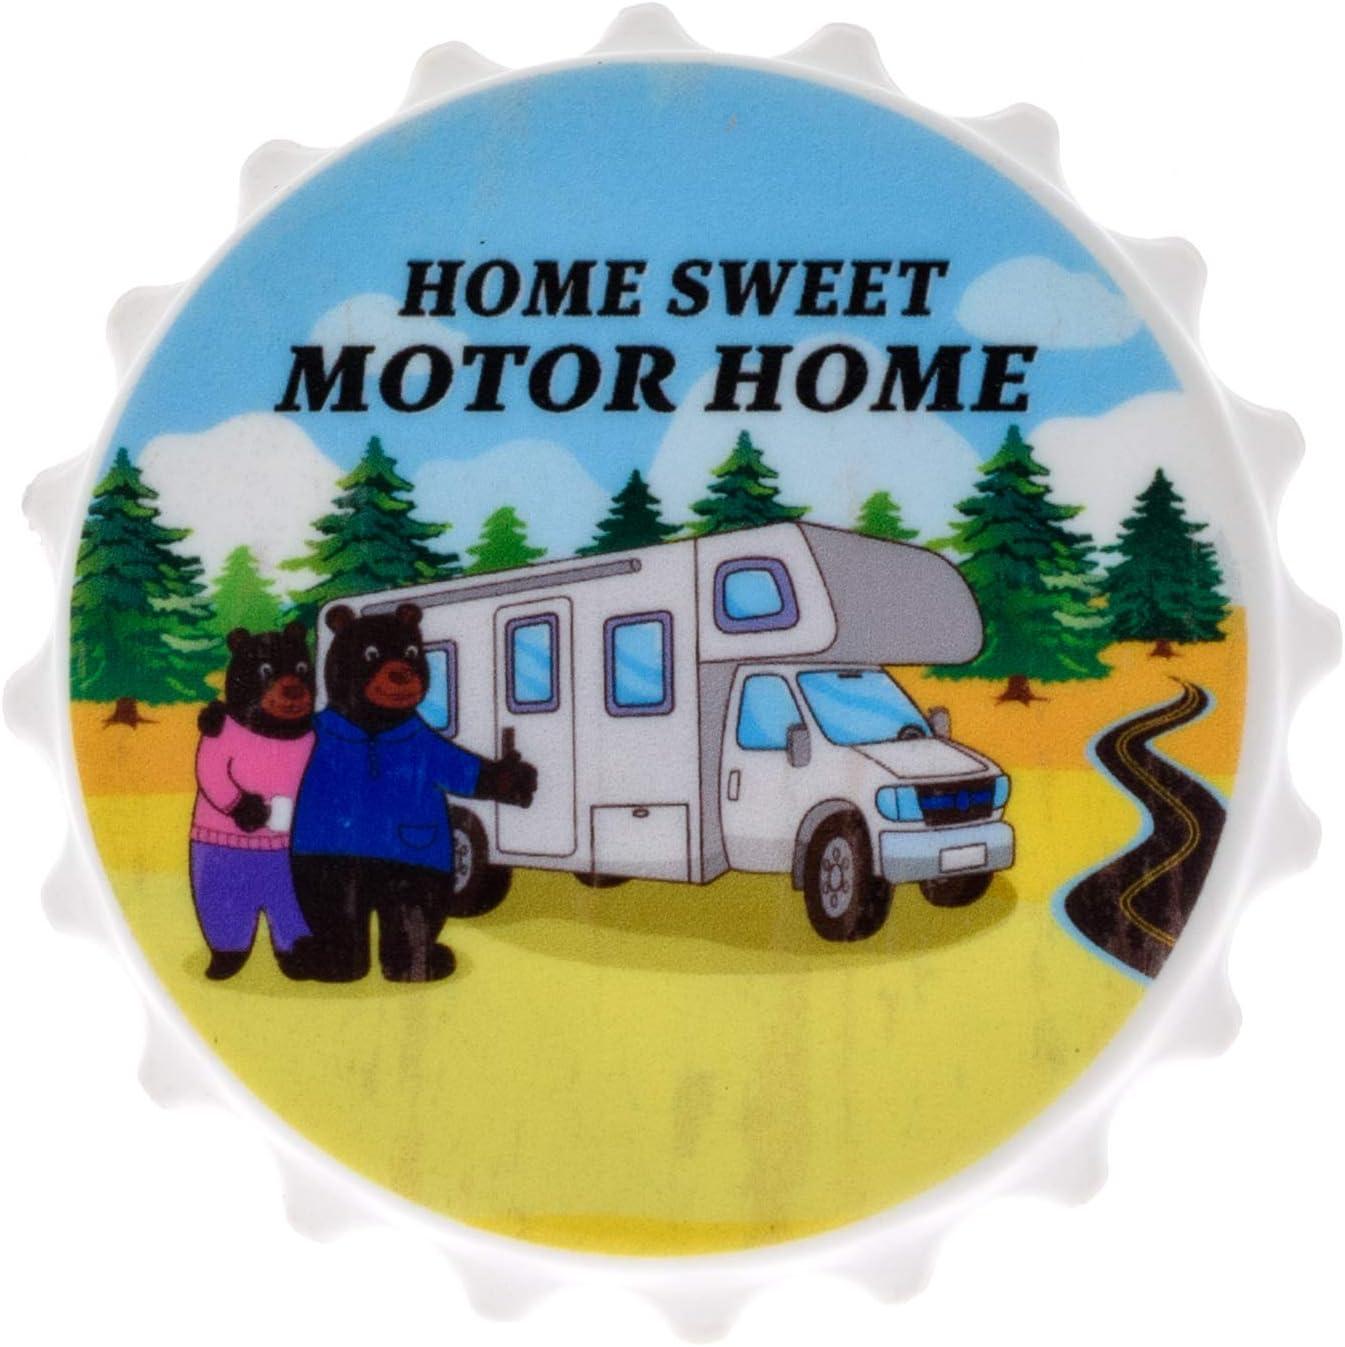 Magnetic Bottle Opener for Refrigerator - Black Bear Home Sweet Motor Home Beer Bottle Opener Wall Mount - Bar Accessories and Gifts Bottle Cap Opener